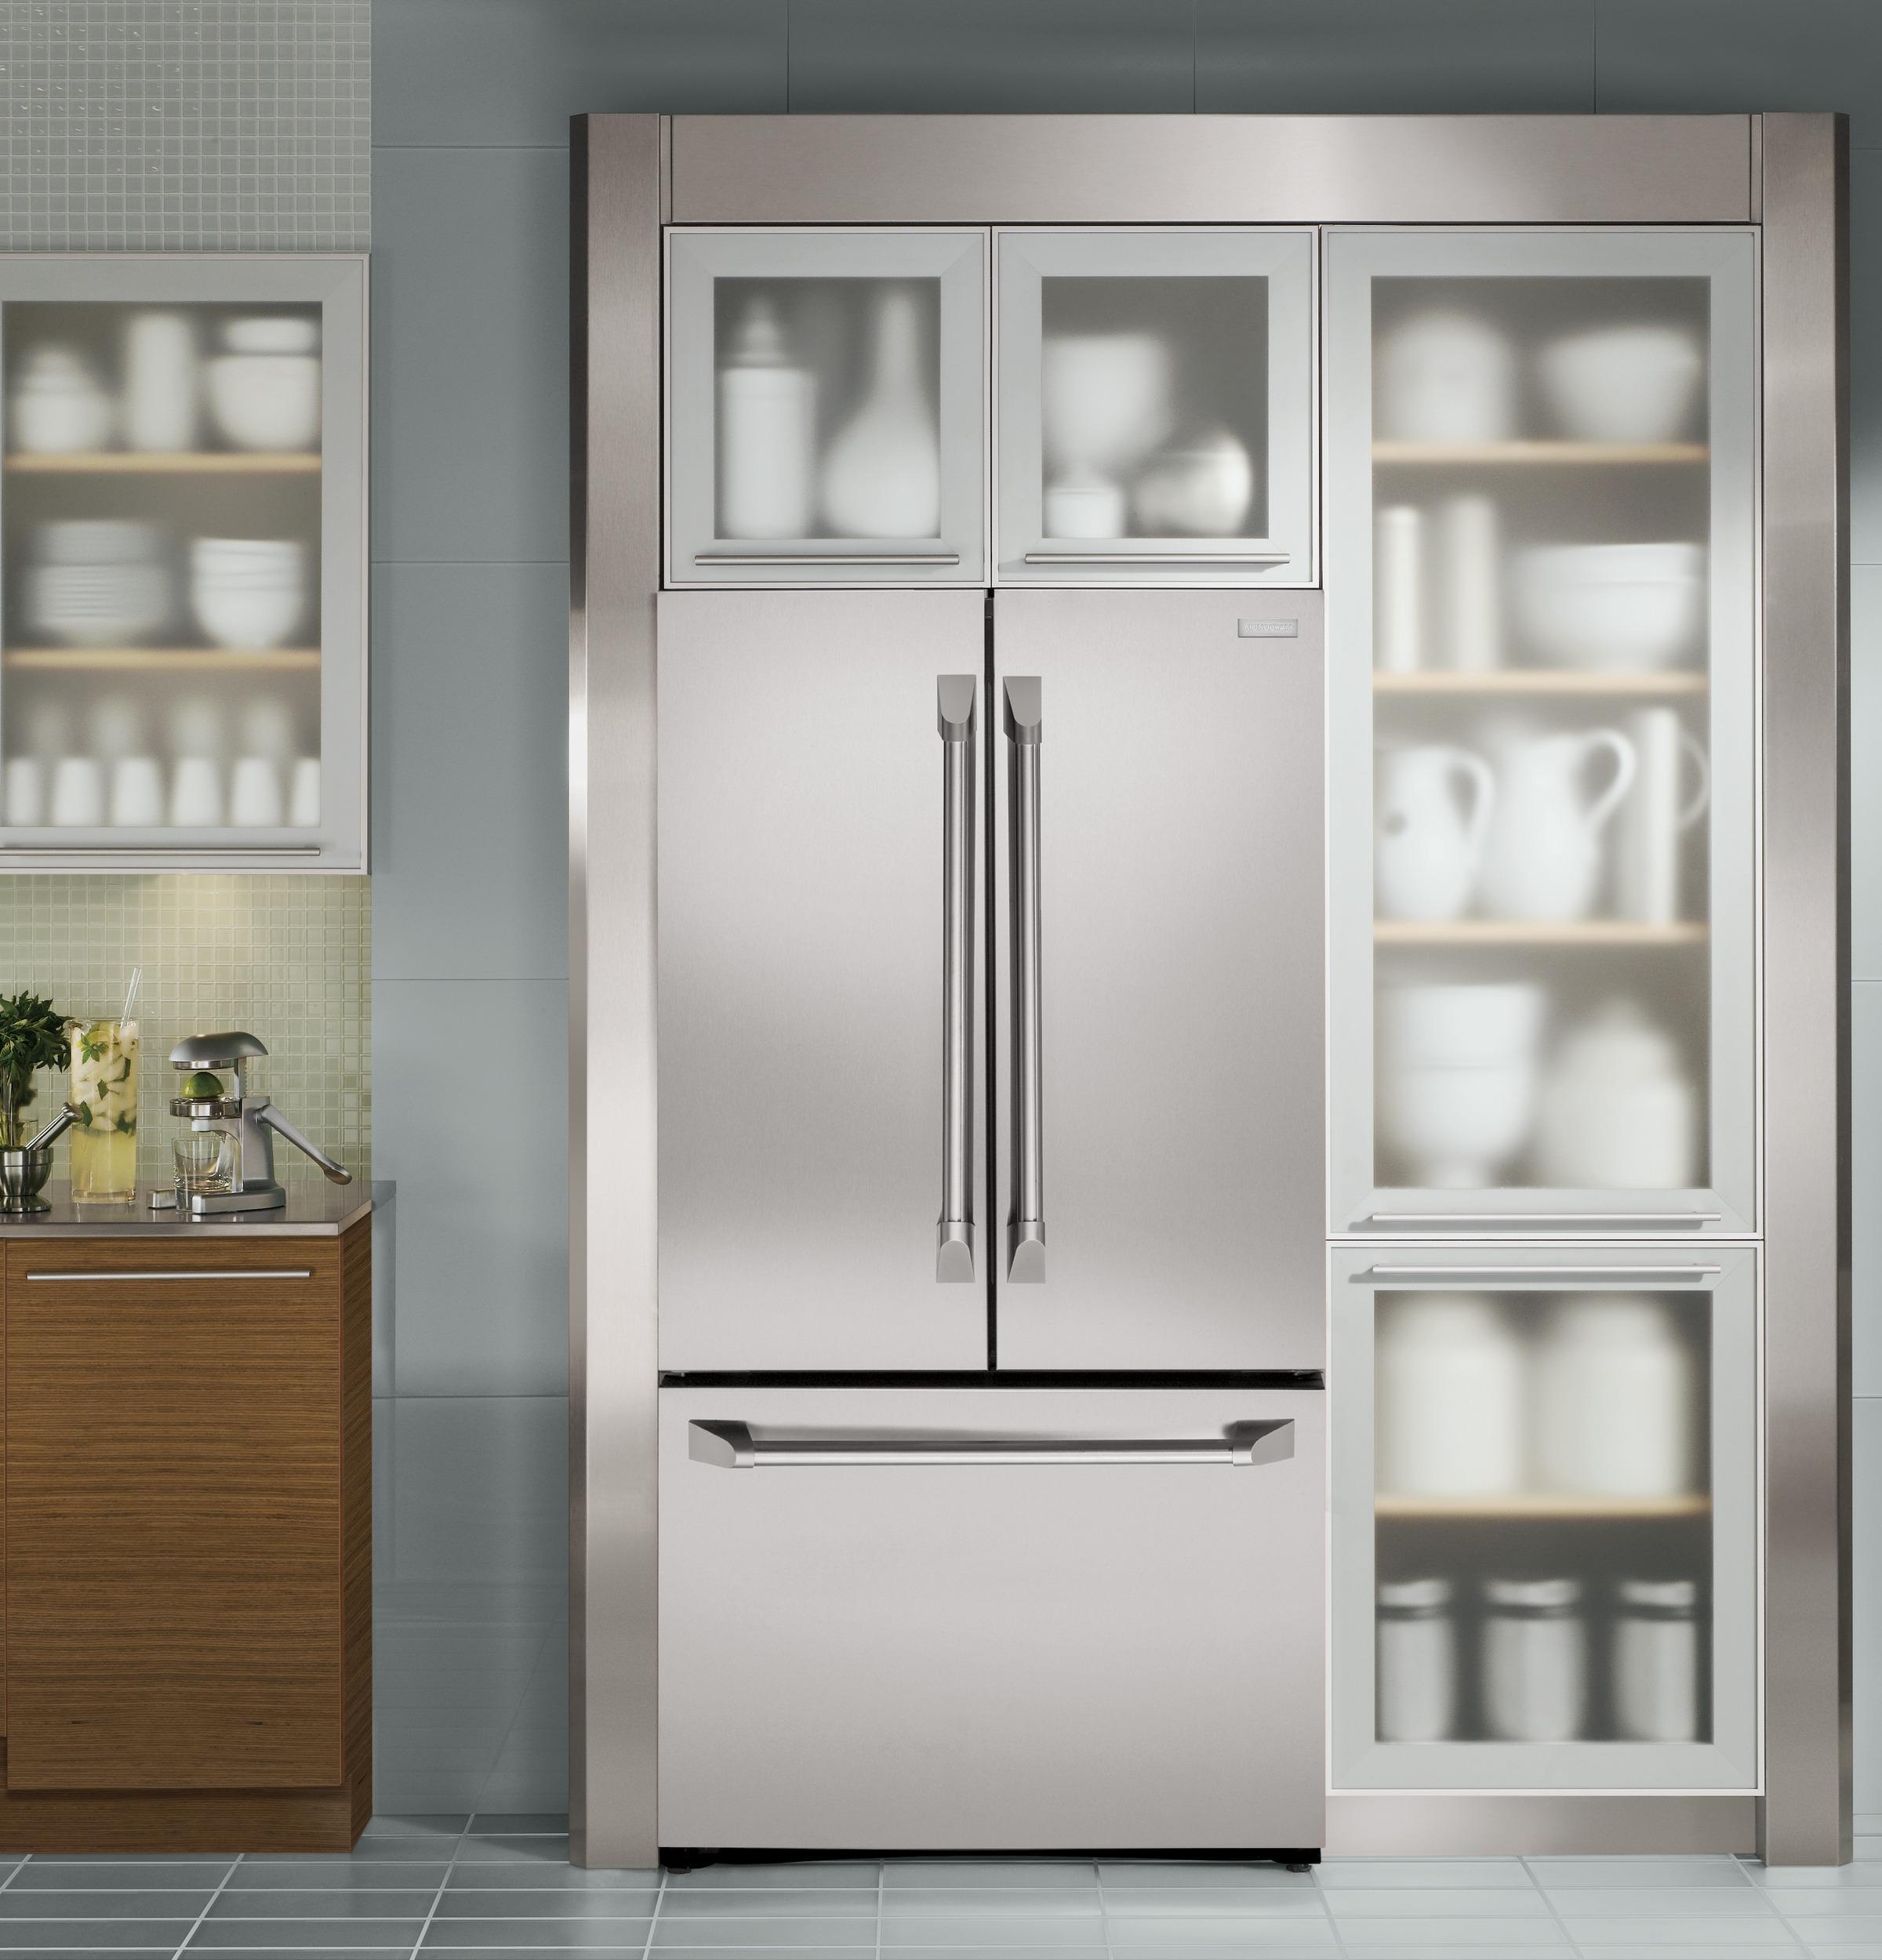 Beau Monogram ENERGY STAR® 23.1 Cu. Ft. Counter Depth French Door Refrigerator